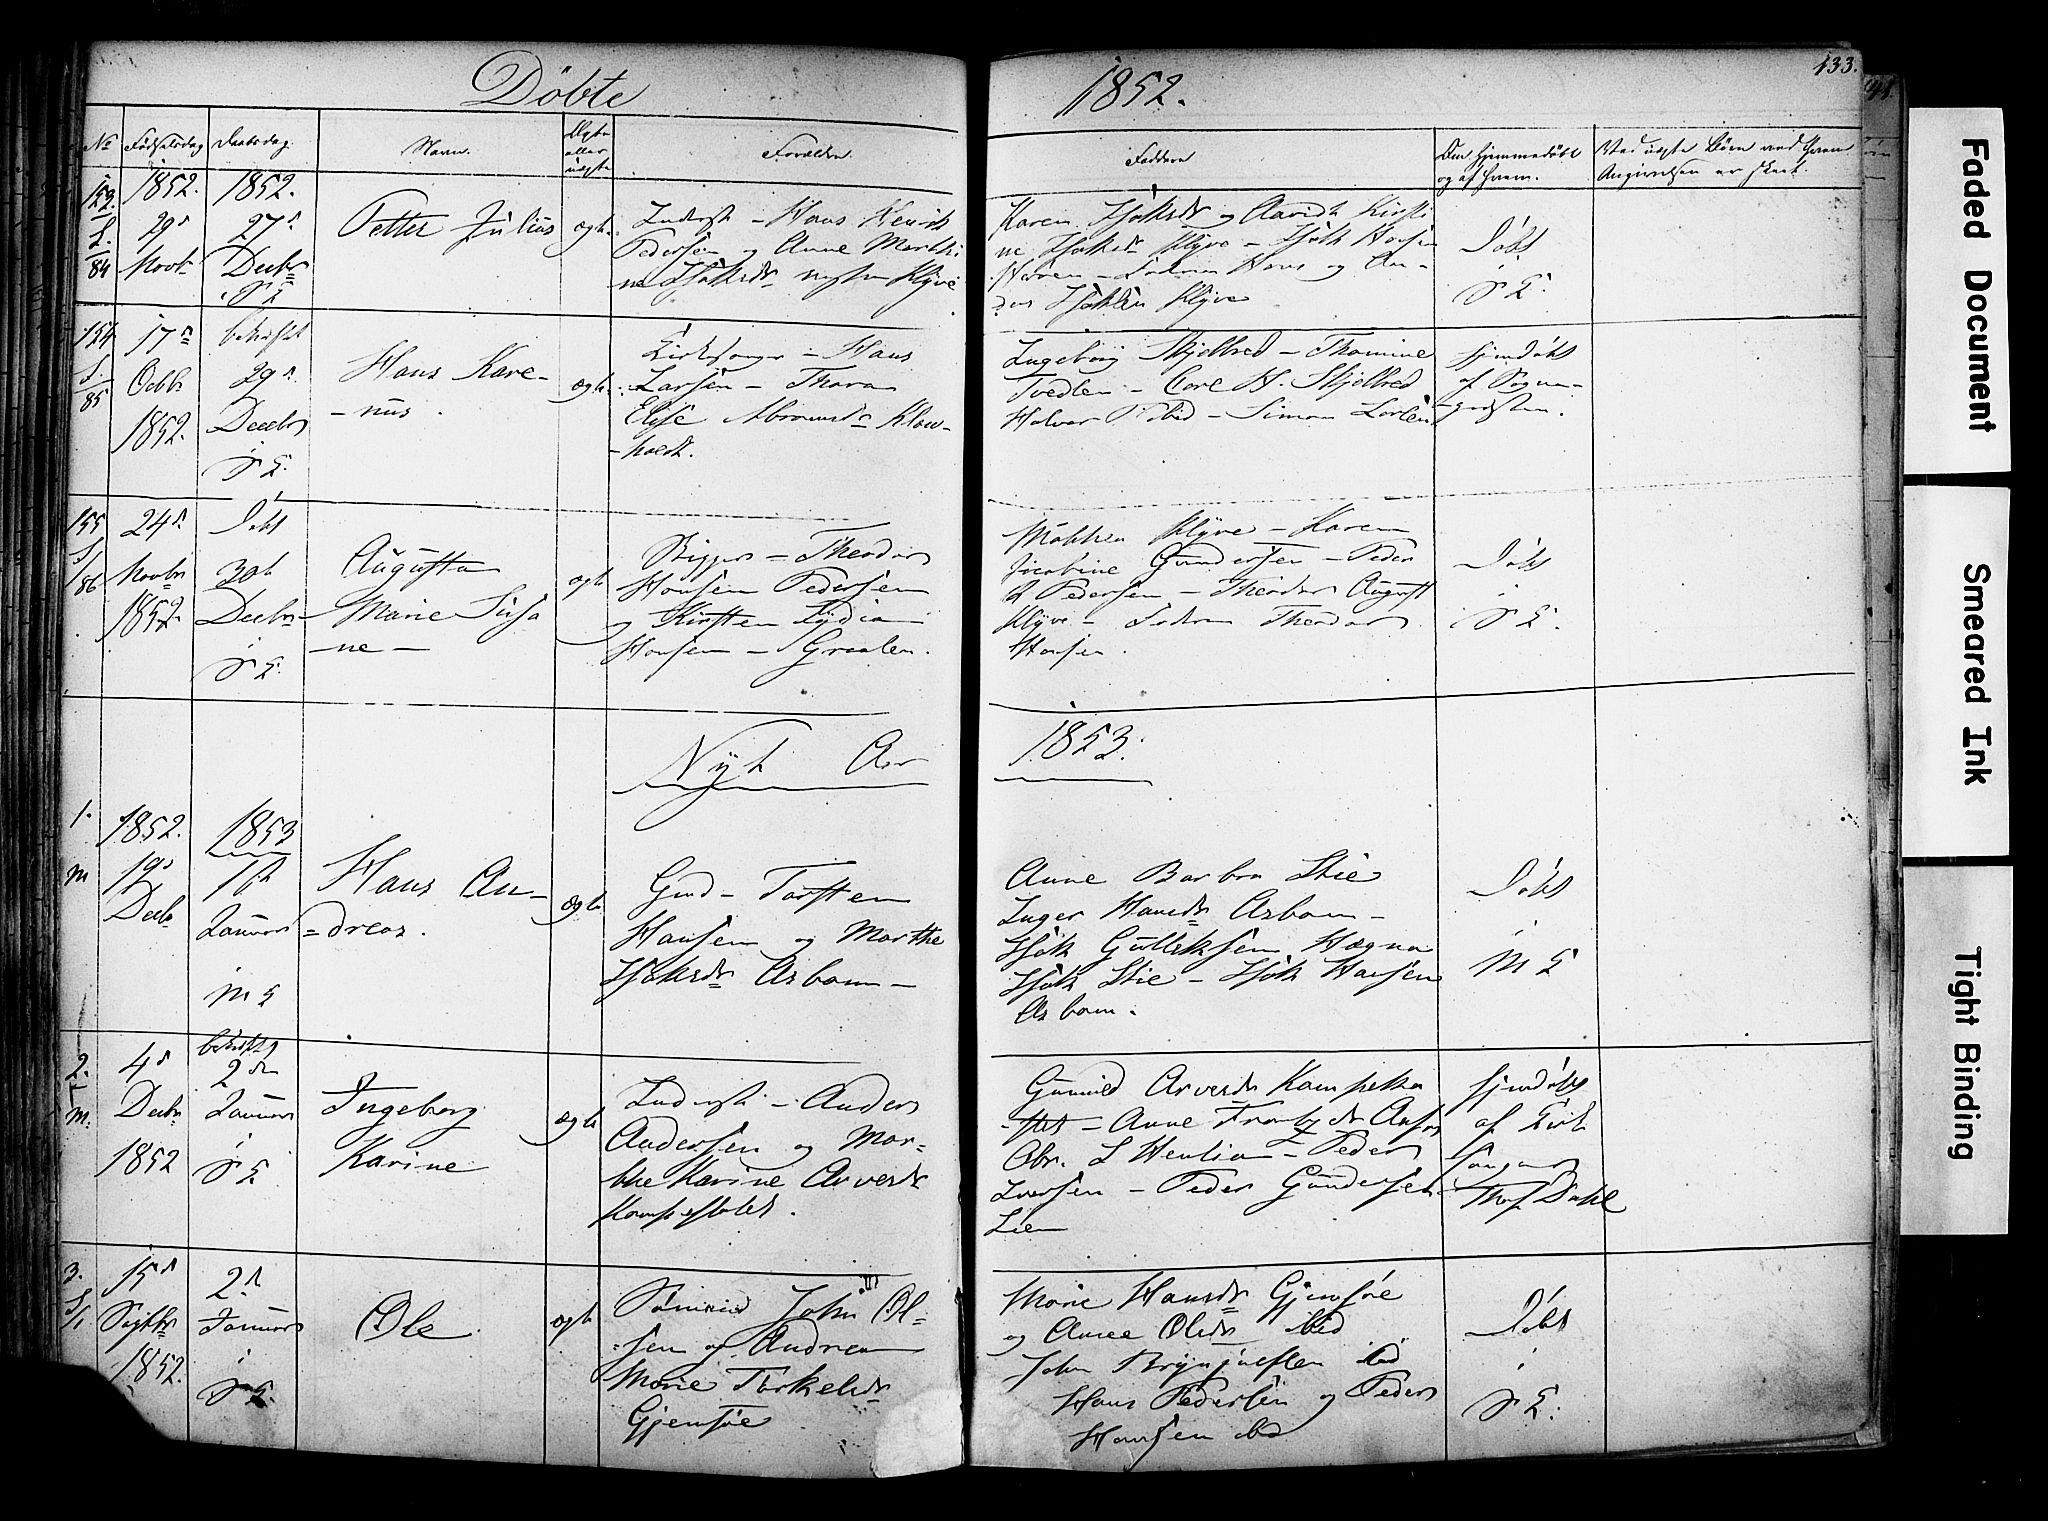 SAKO, Solum kirkebøker, F/Fa/L0006: Ministerialbok nr. I 6, 1844-1855, s. 133